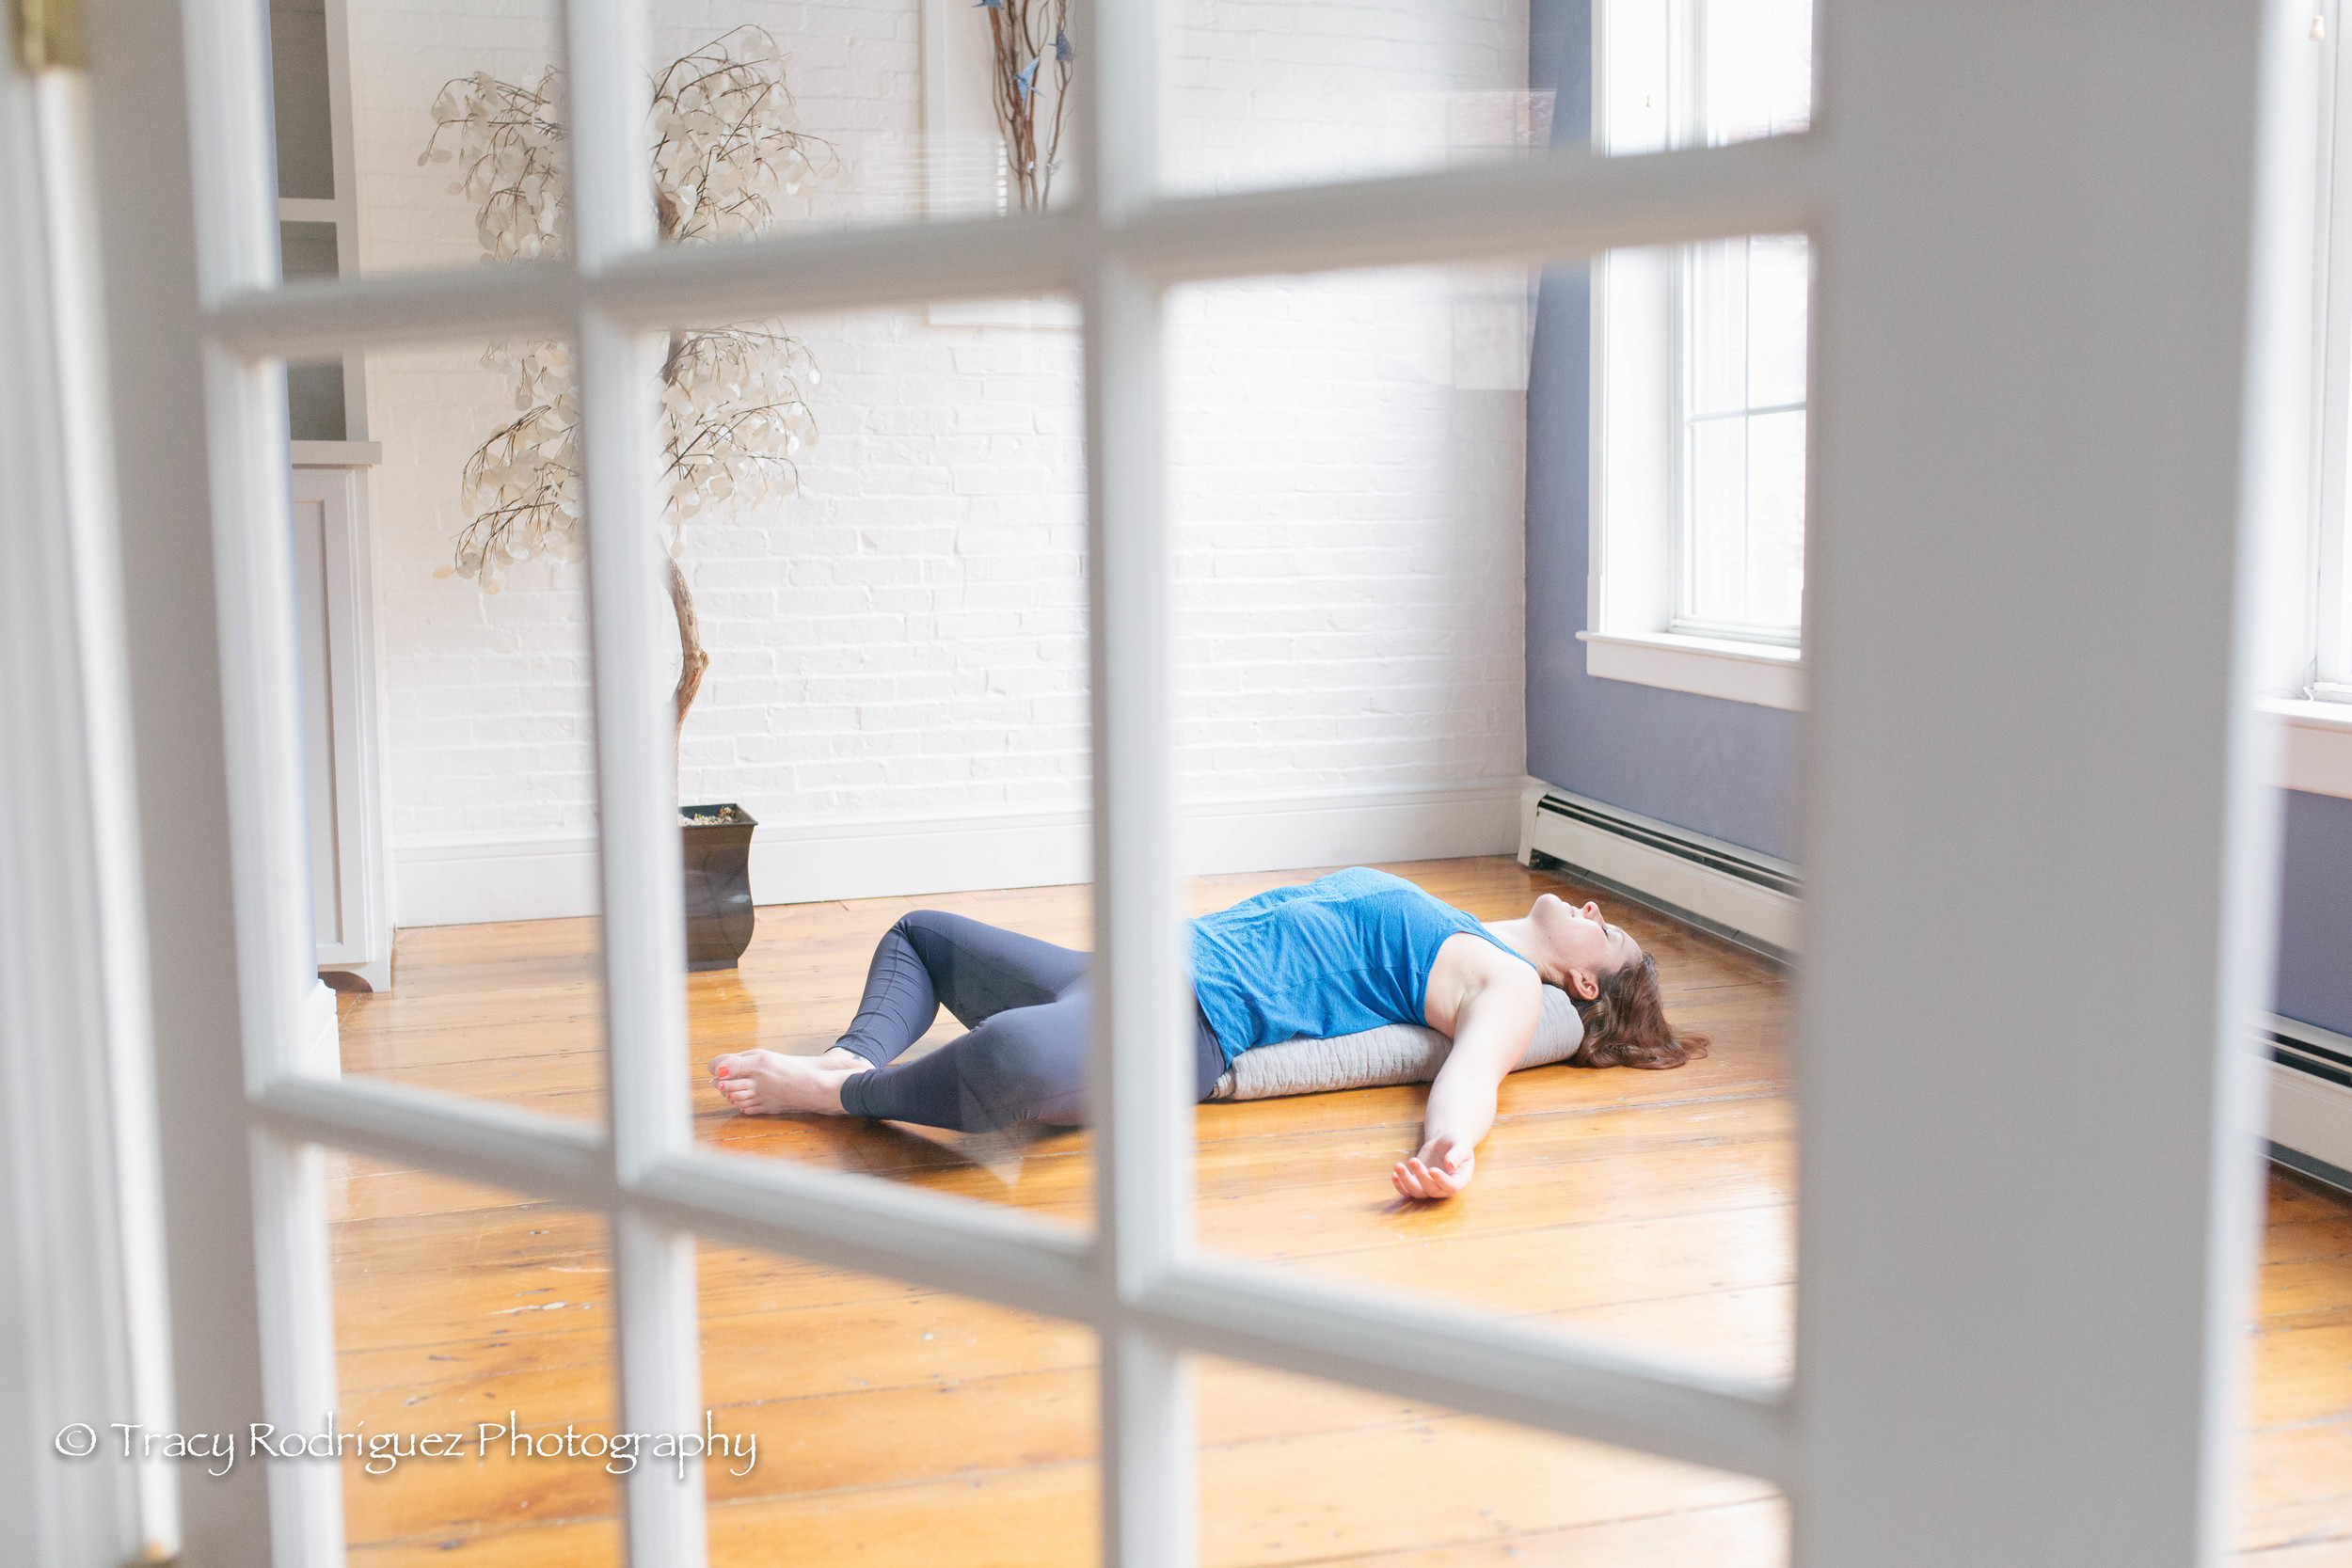 TracyRodriguezPhotography-HEATHER-WHITE-YOGA-14.jpg